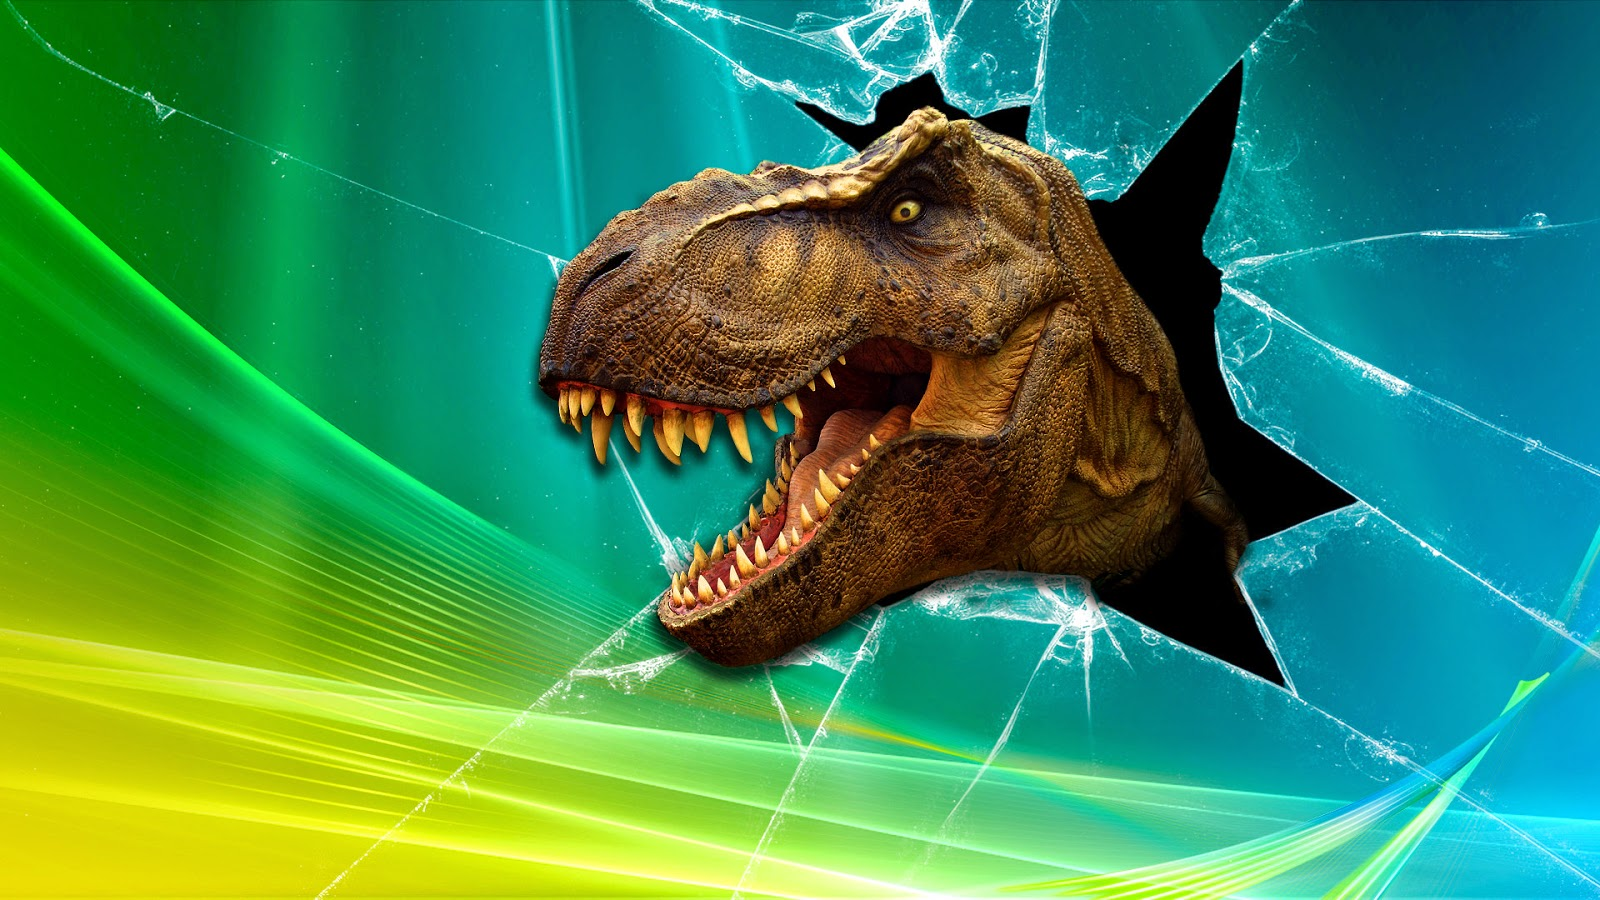 T-Rex bursting through a monitor screen